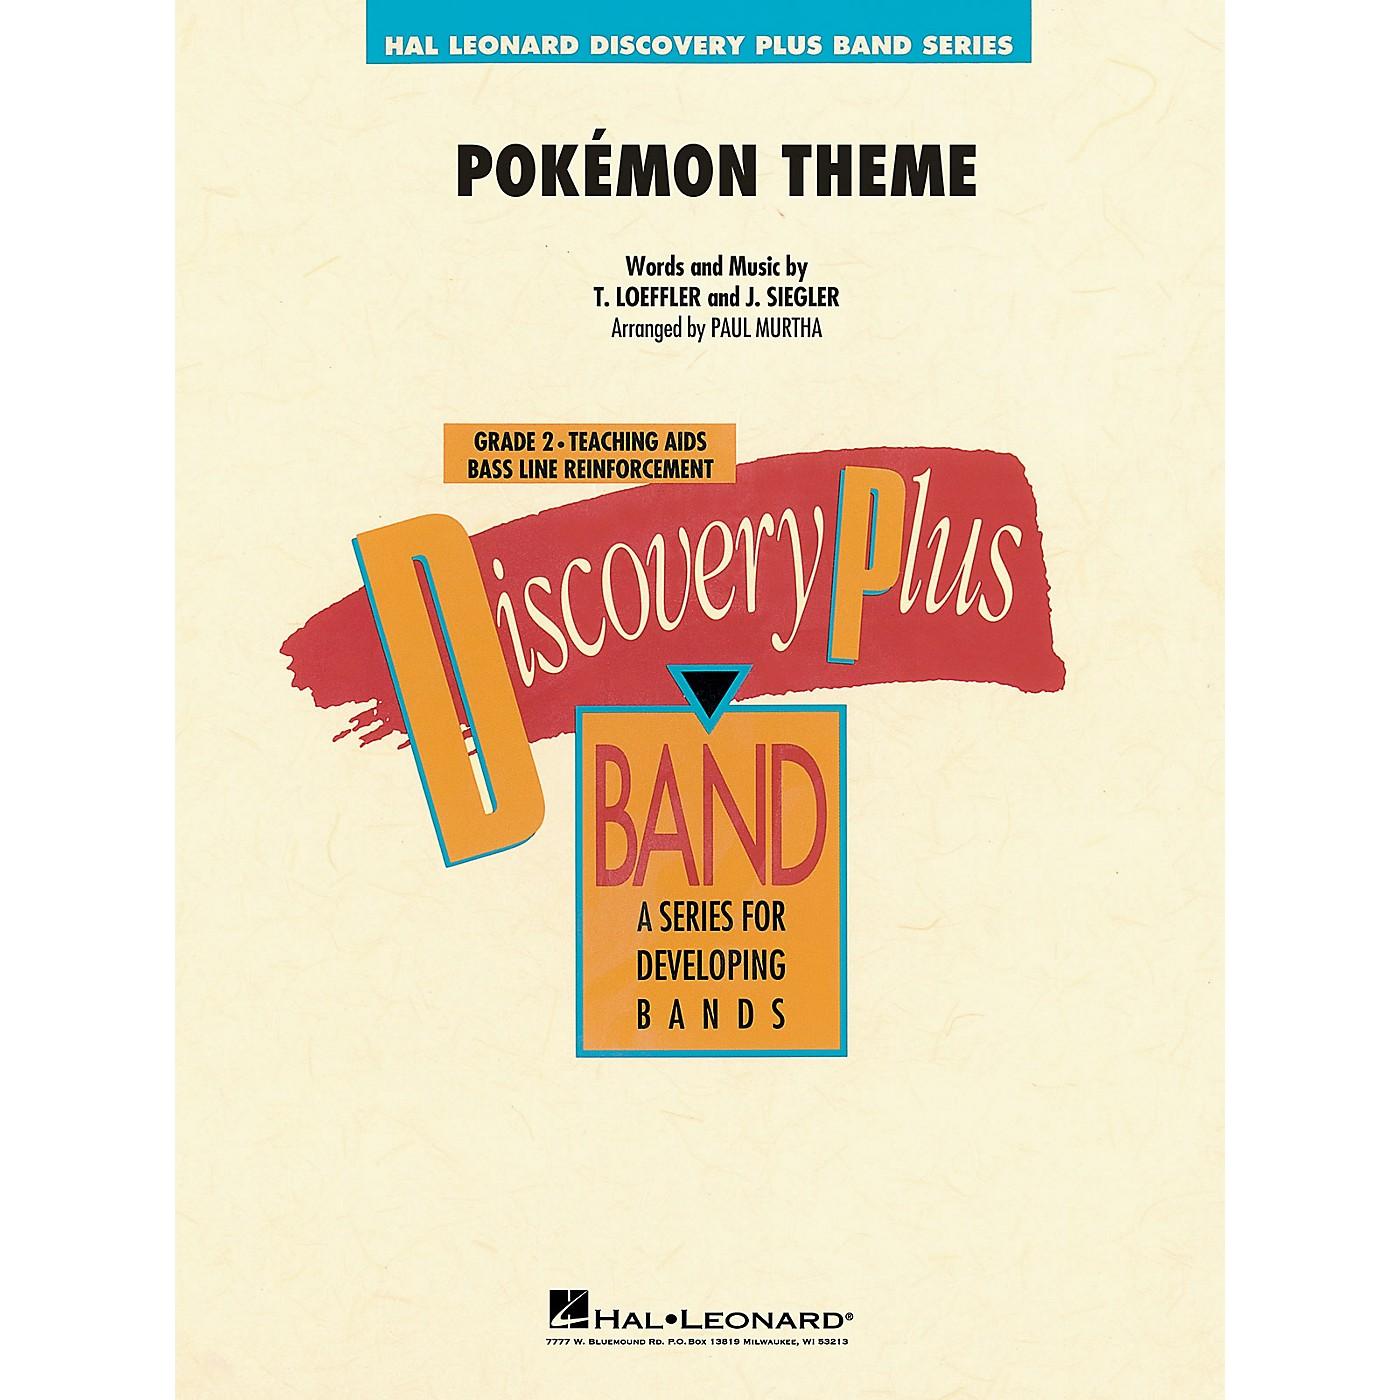 Hal Leonard Pokémon Theme - Discovery Plus Concert Band Series Level 2 arranged by Paul Murtha thumbnail